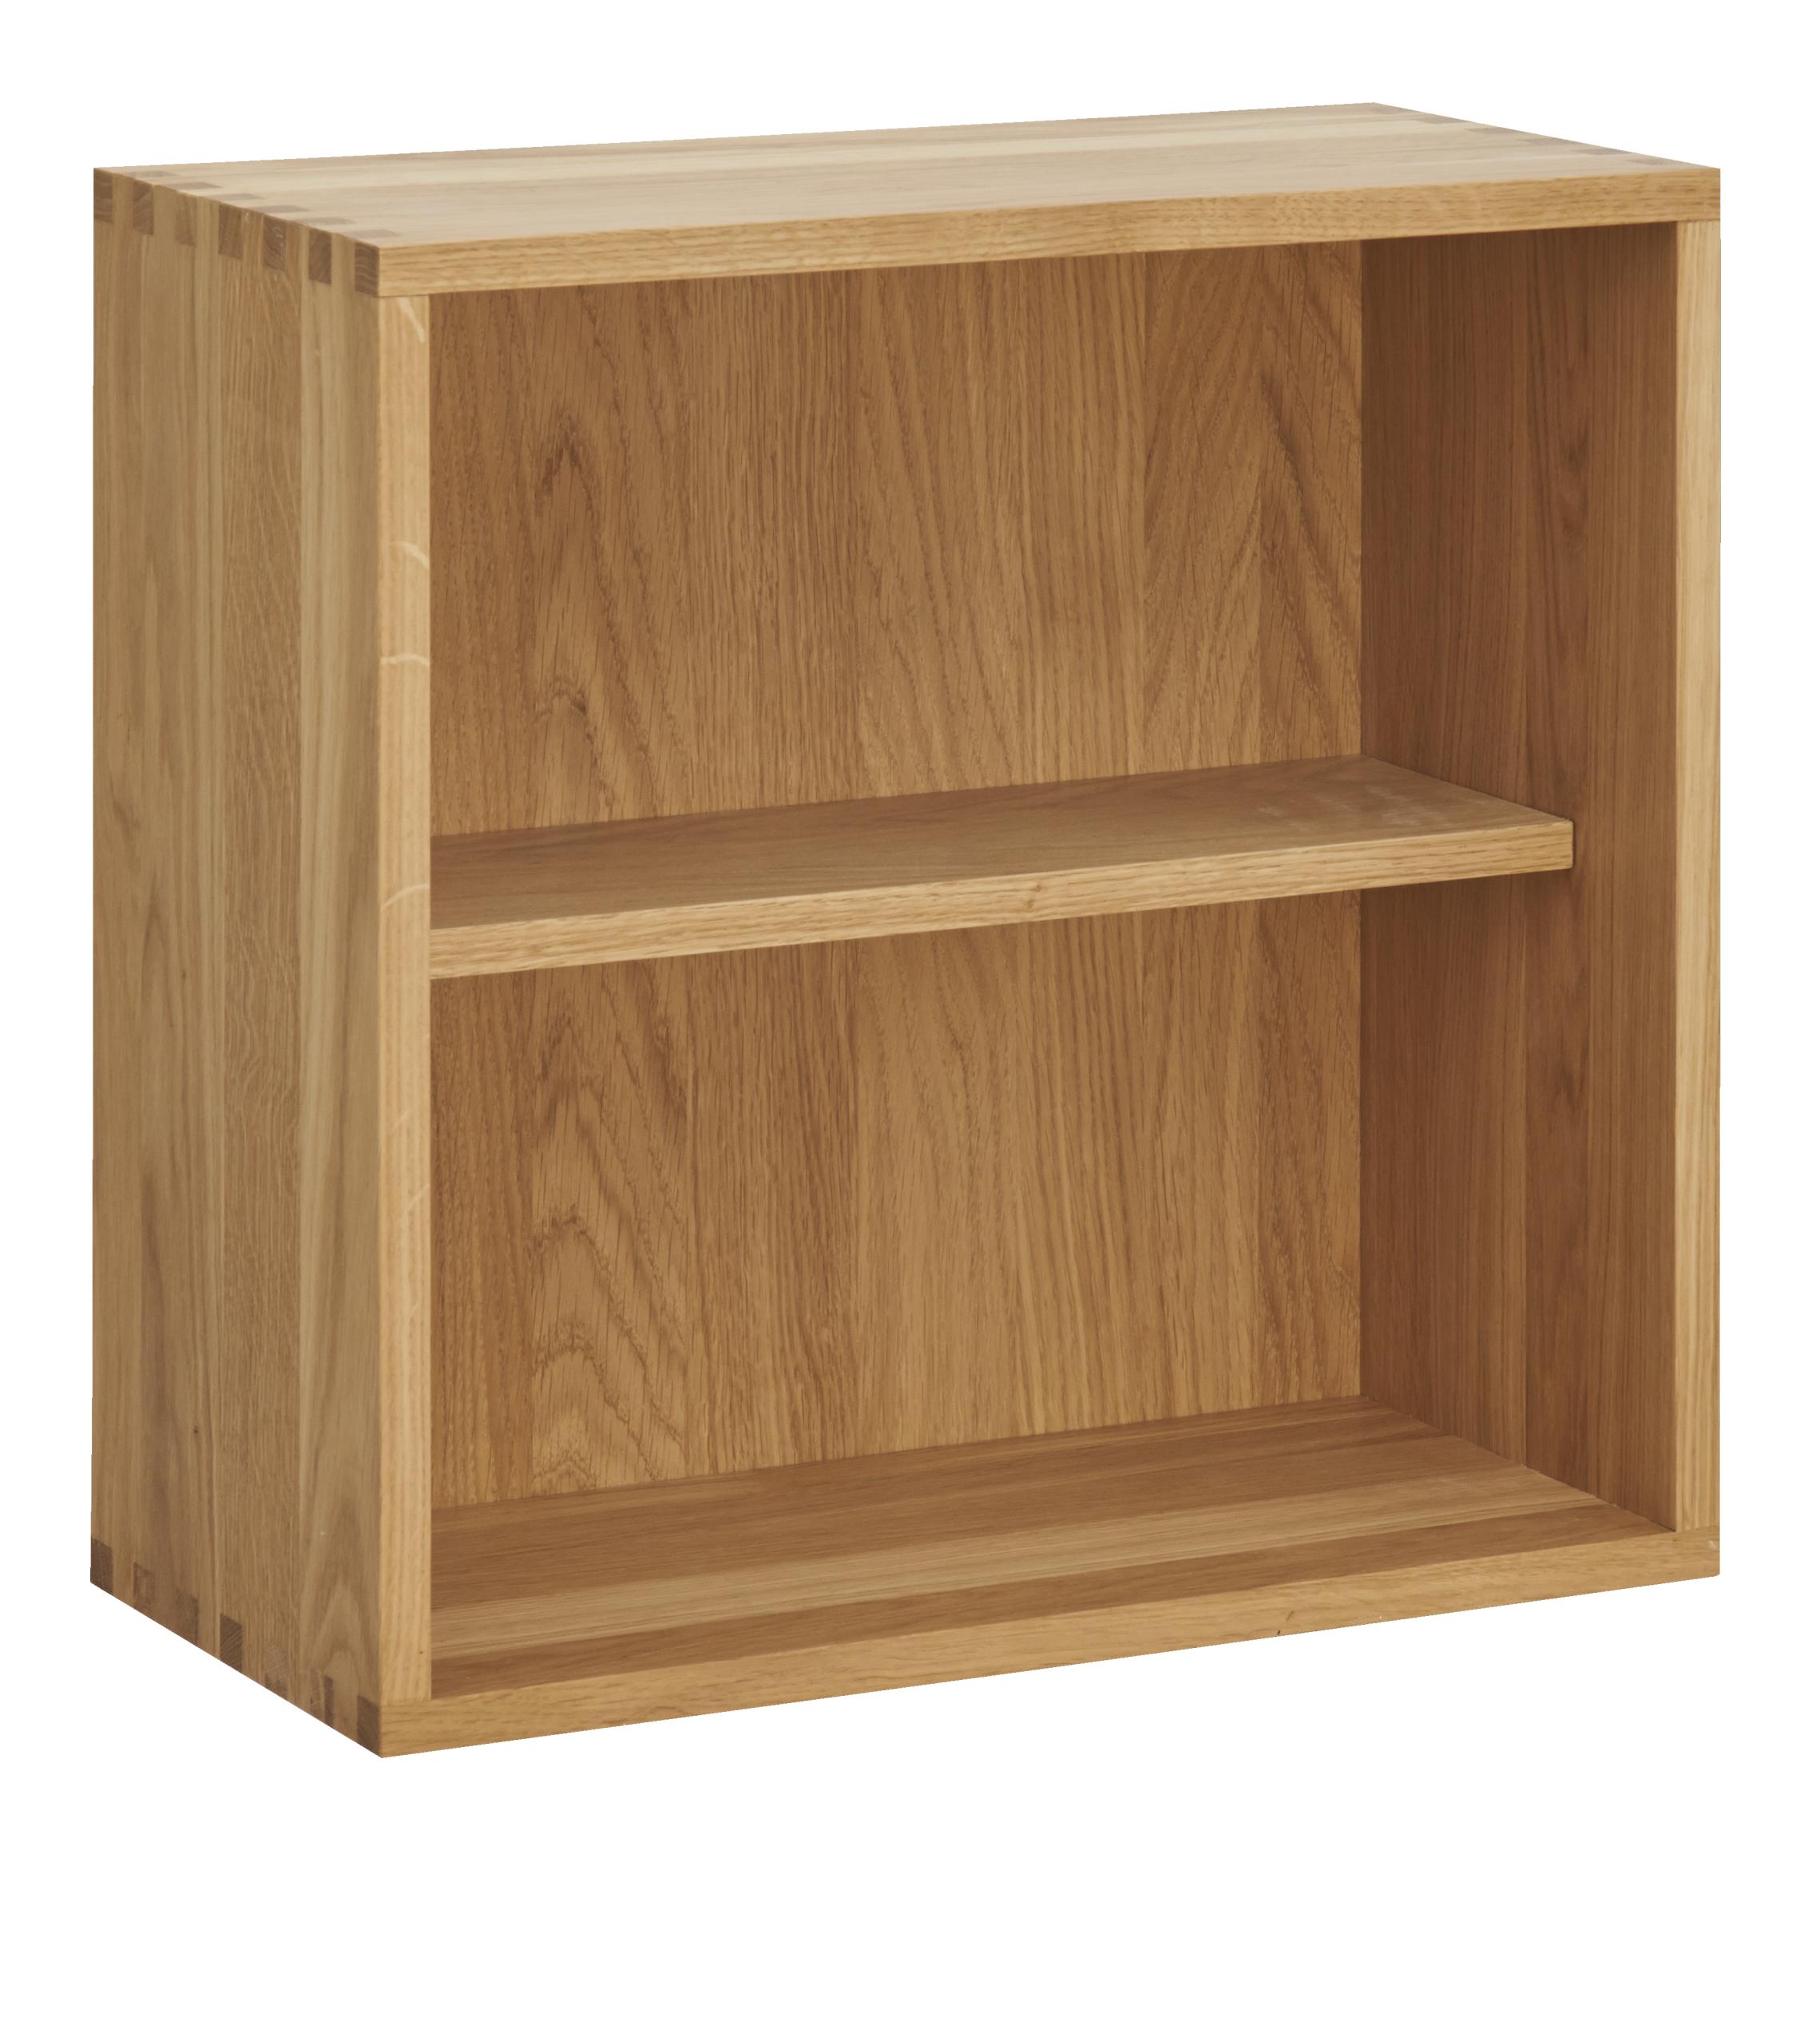 brick kombinierbares element | muebles tele | pinterest | brick and